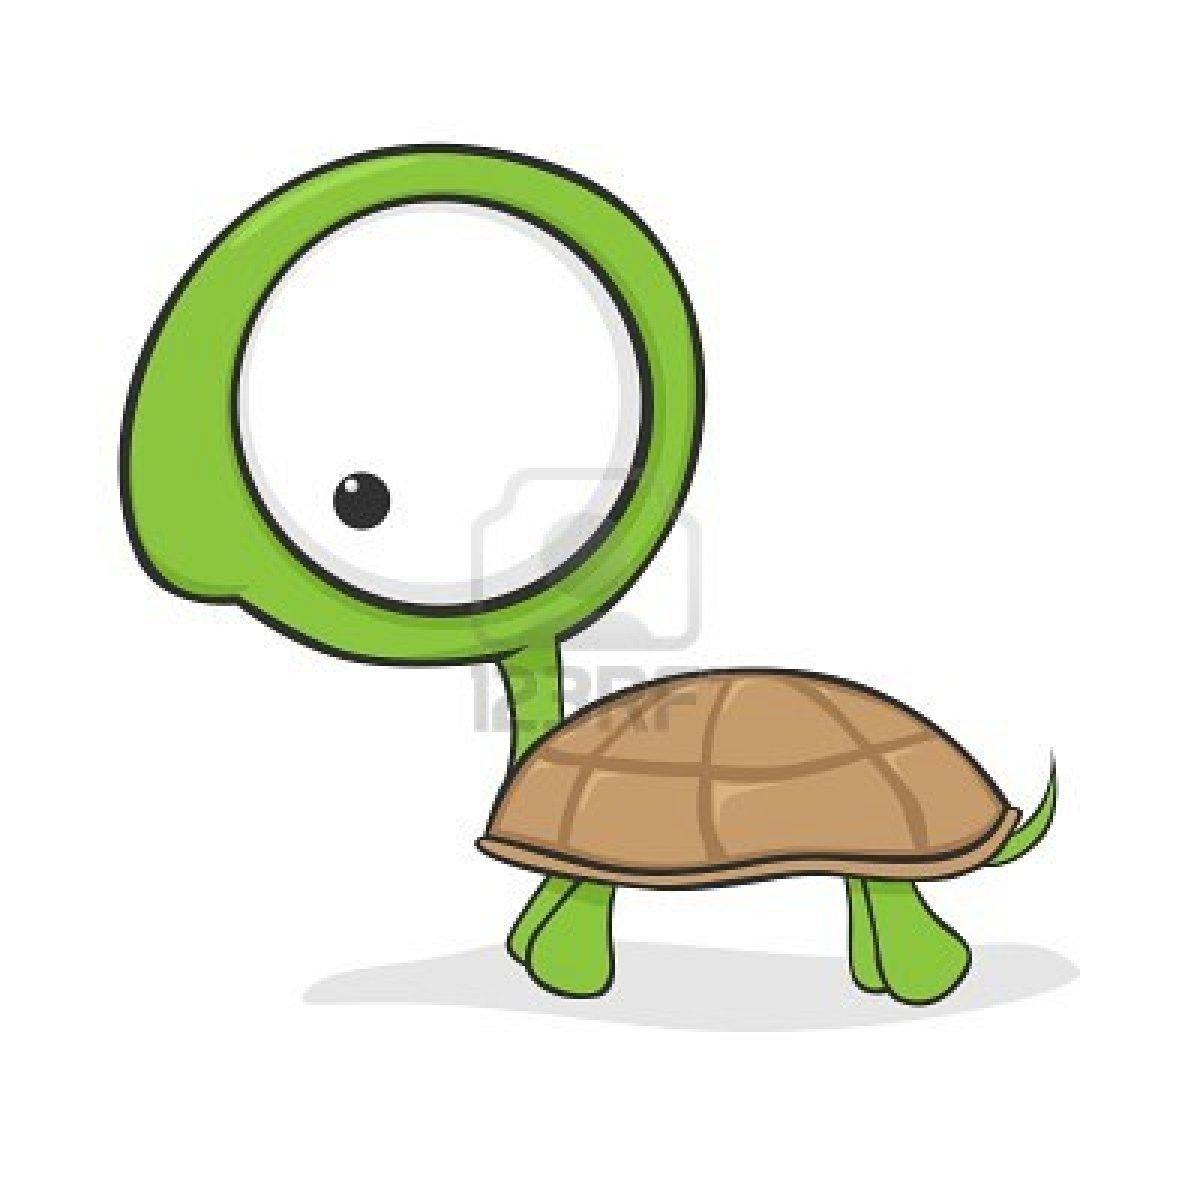 Cute cartoon turtle with huge eyes Stock Photo.